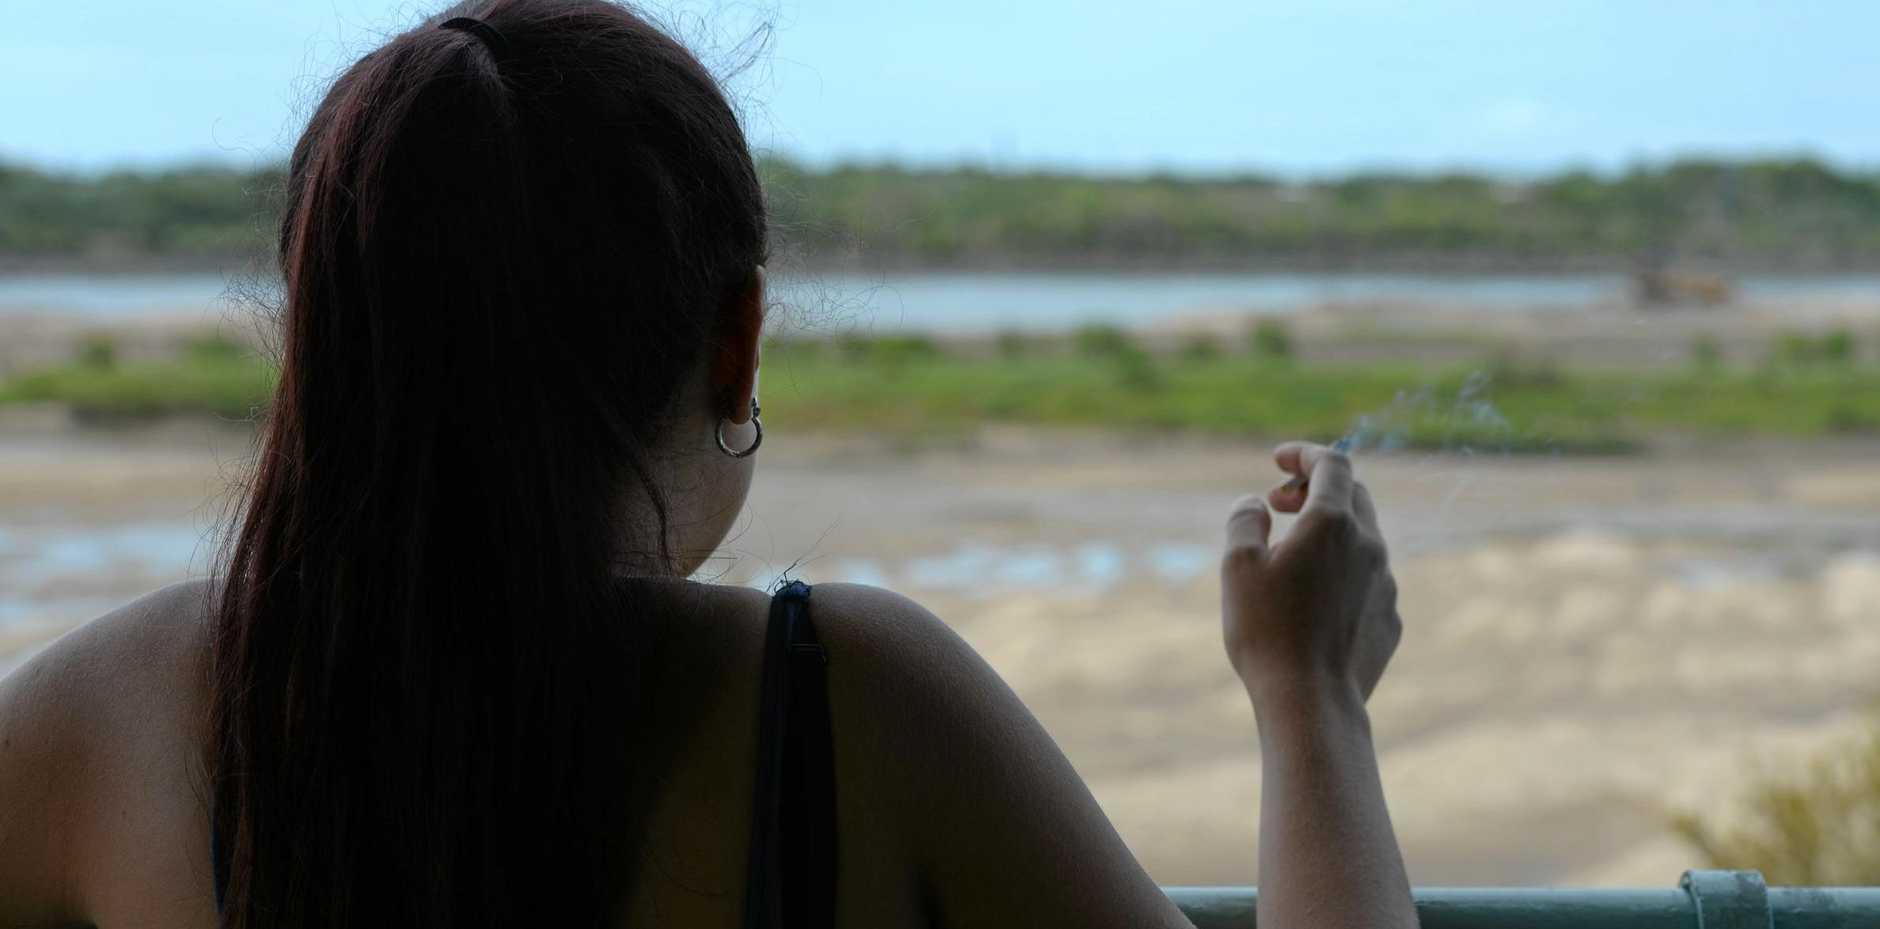 Smokers have been put on notice across the Bundaberg region.